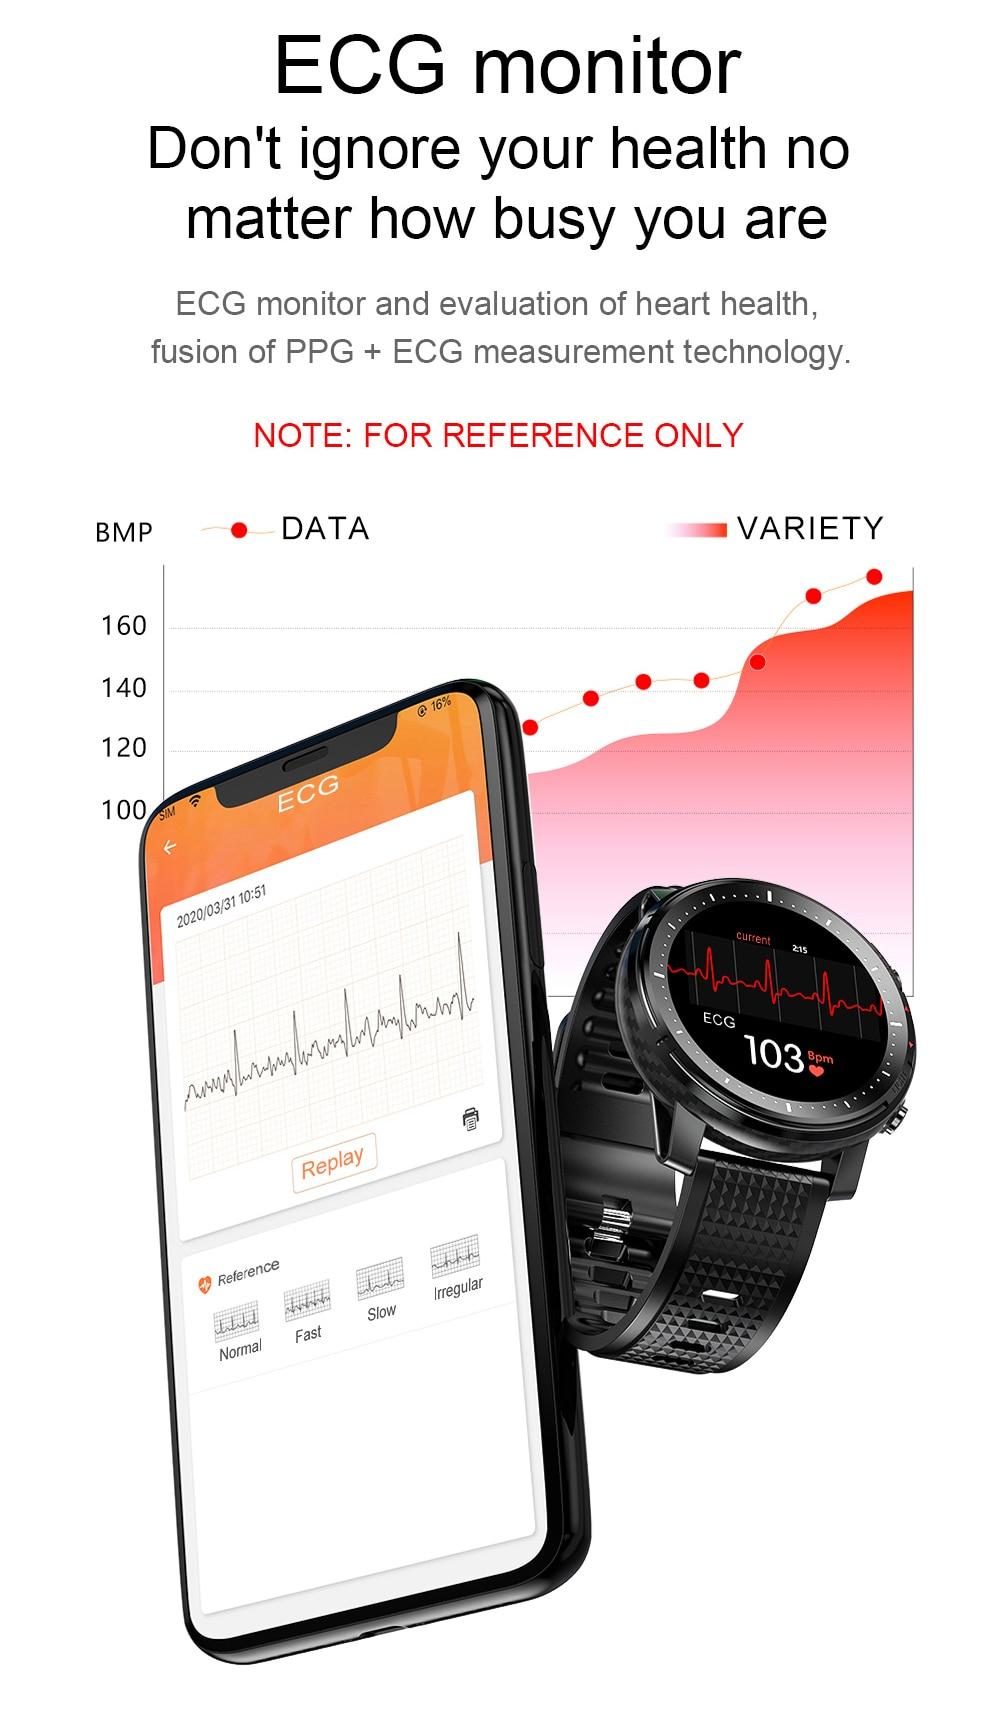 Hfc321f57864644a6962fd78b44f2115fF Timewolf Reloj Inteligente Smart Watch Men 2021 IP68 Waterproof Android Smartwatch Smart Watch for Men Women Android Phone IOS